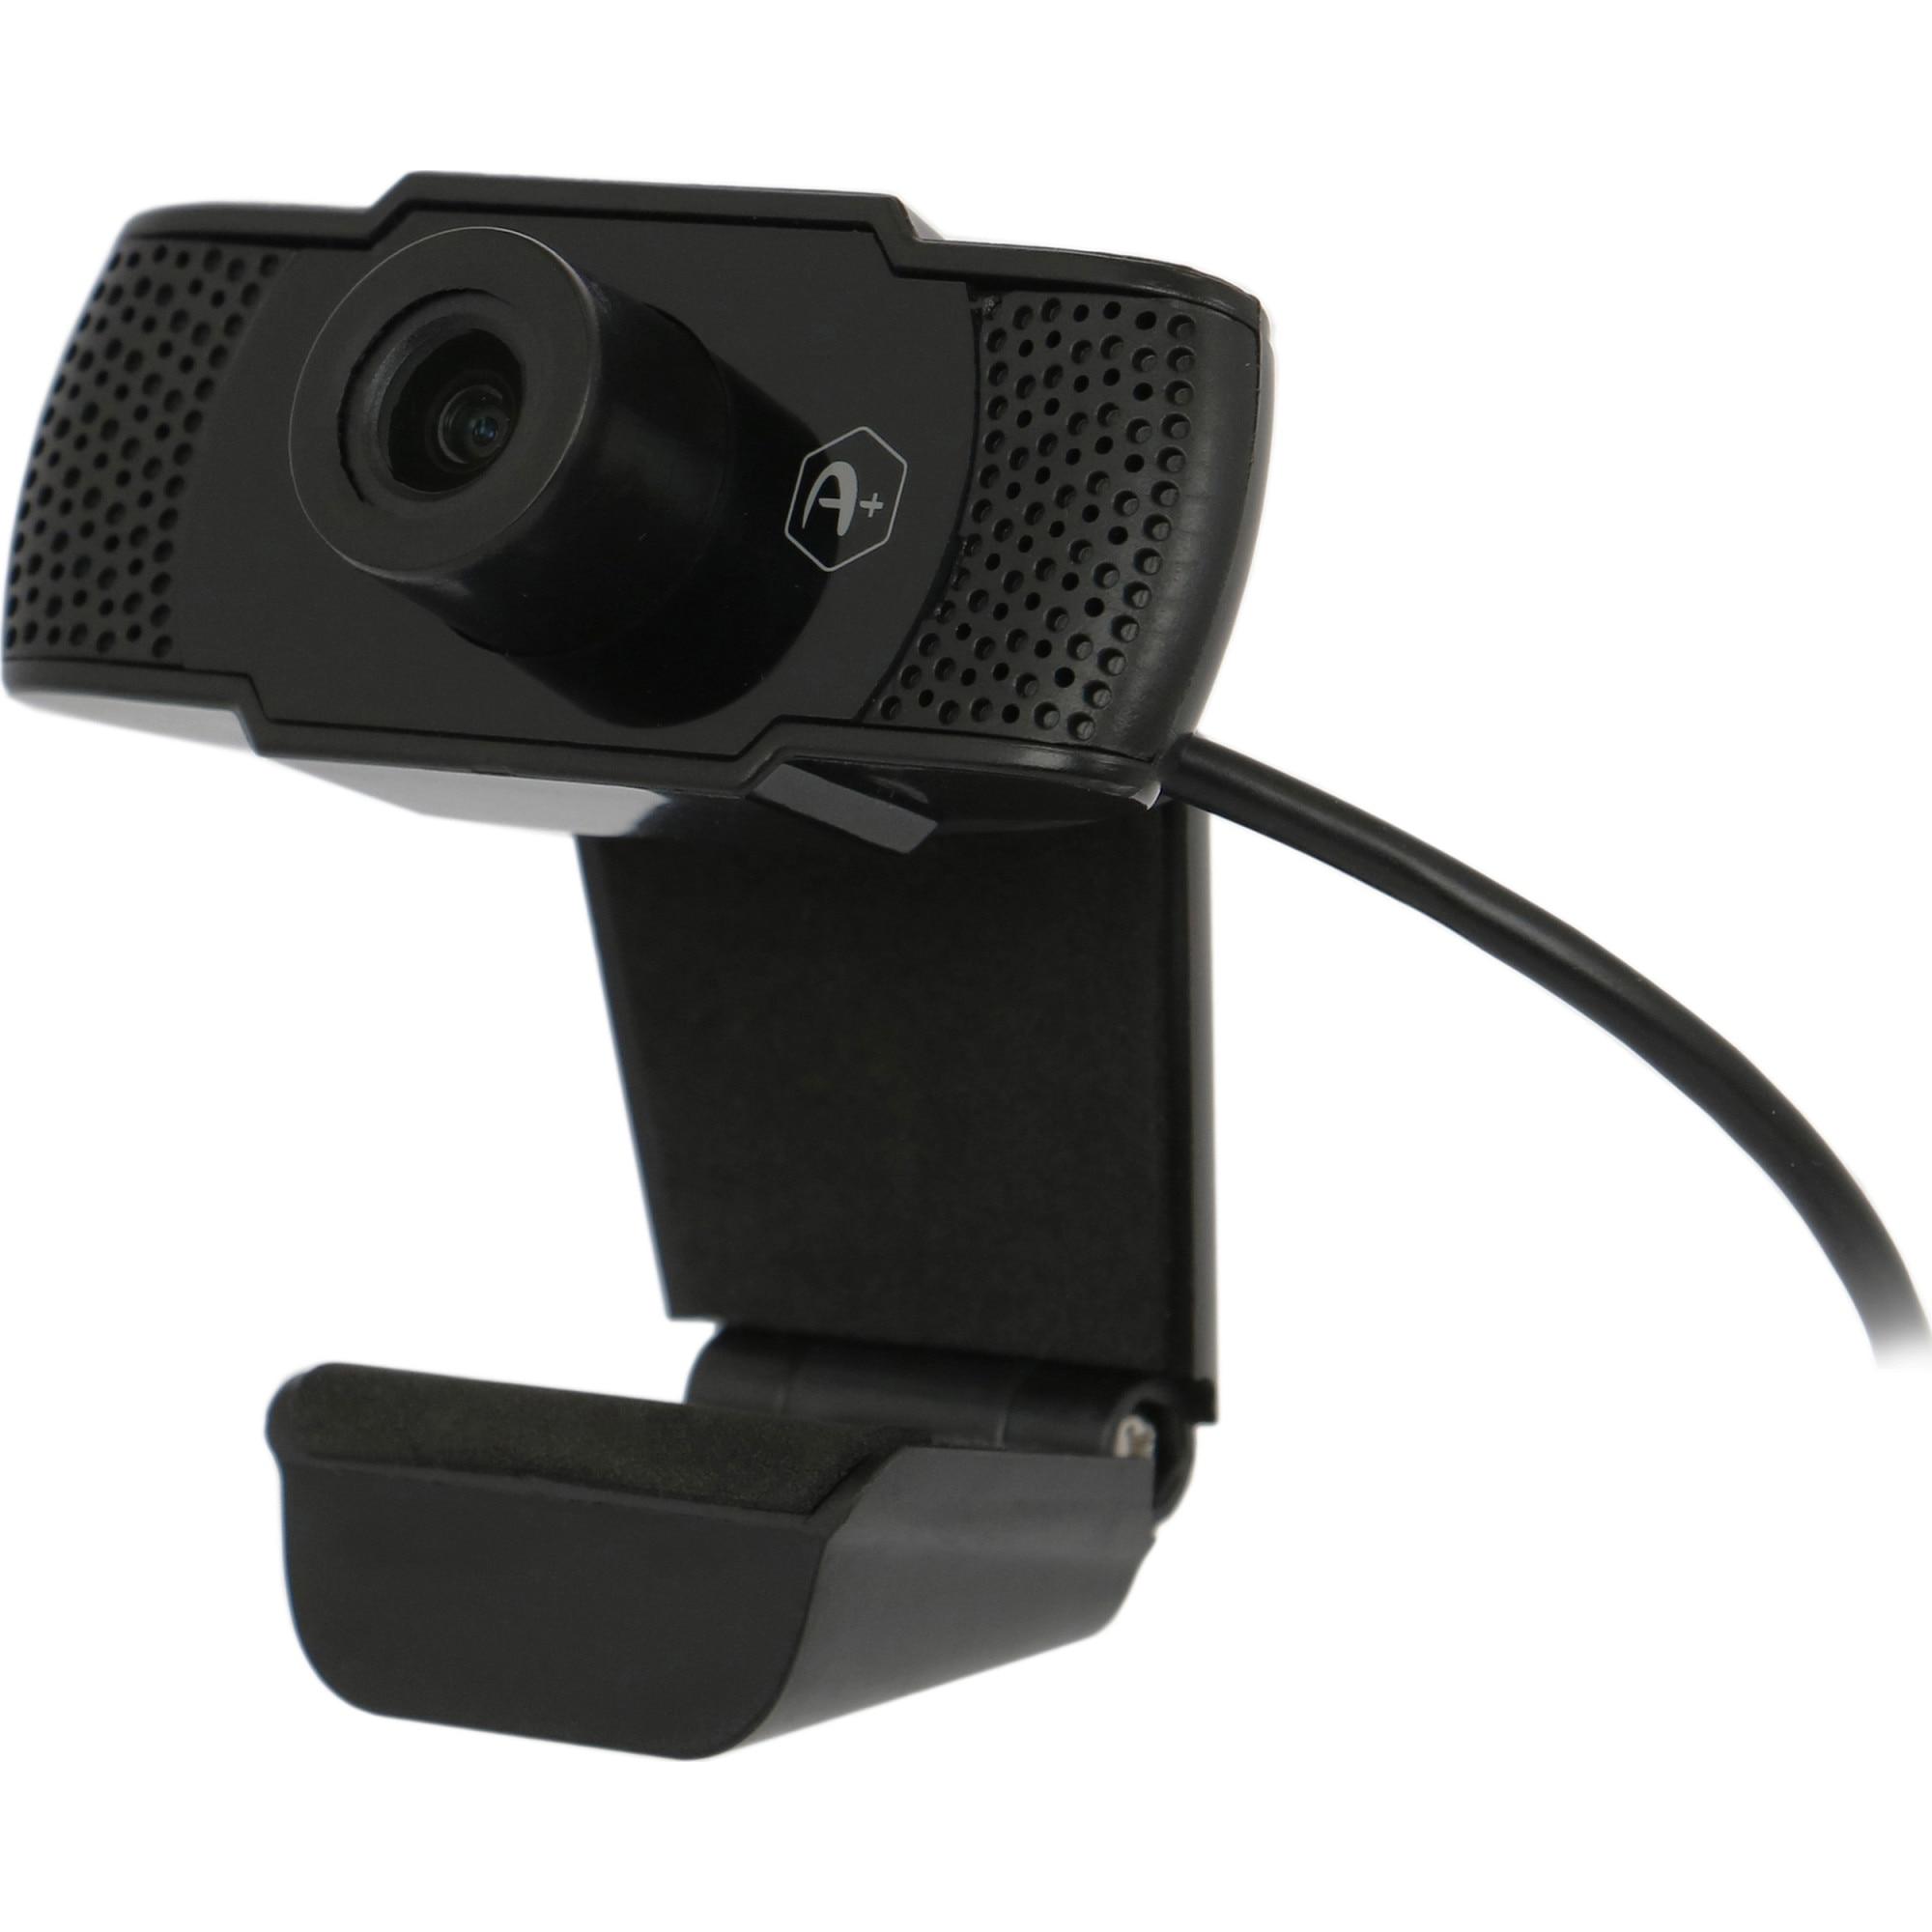 Fotografie Camera Web A+ CW30, microfon, full HD 1080P, plug and play